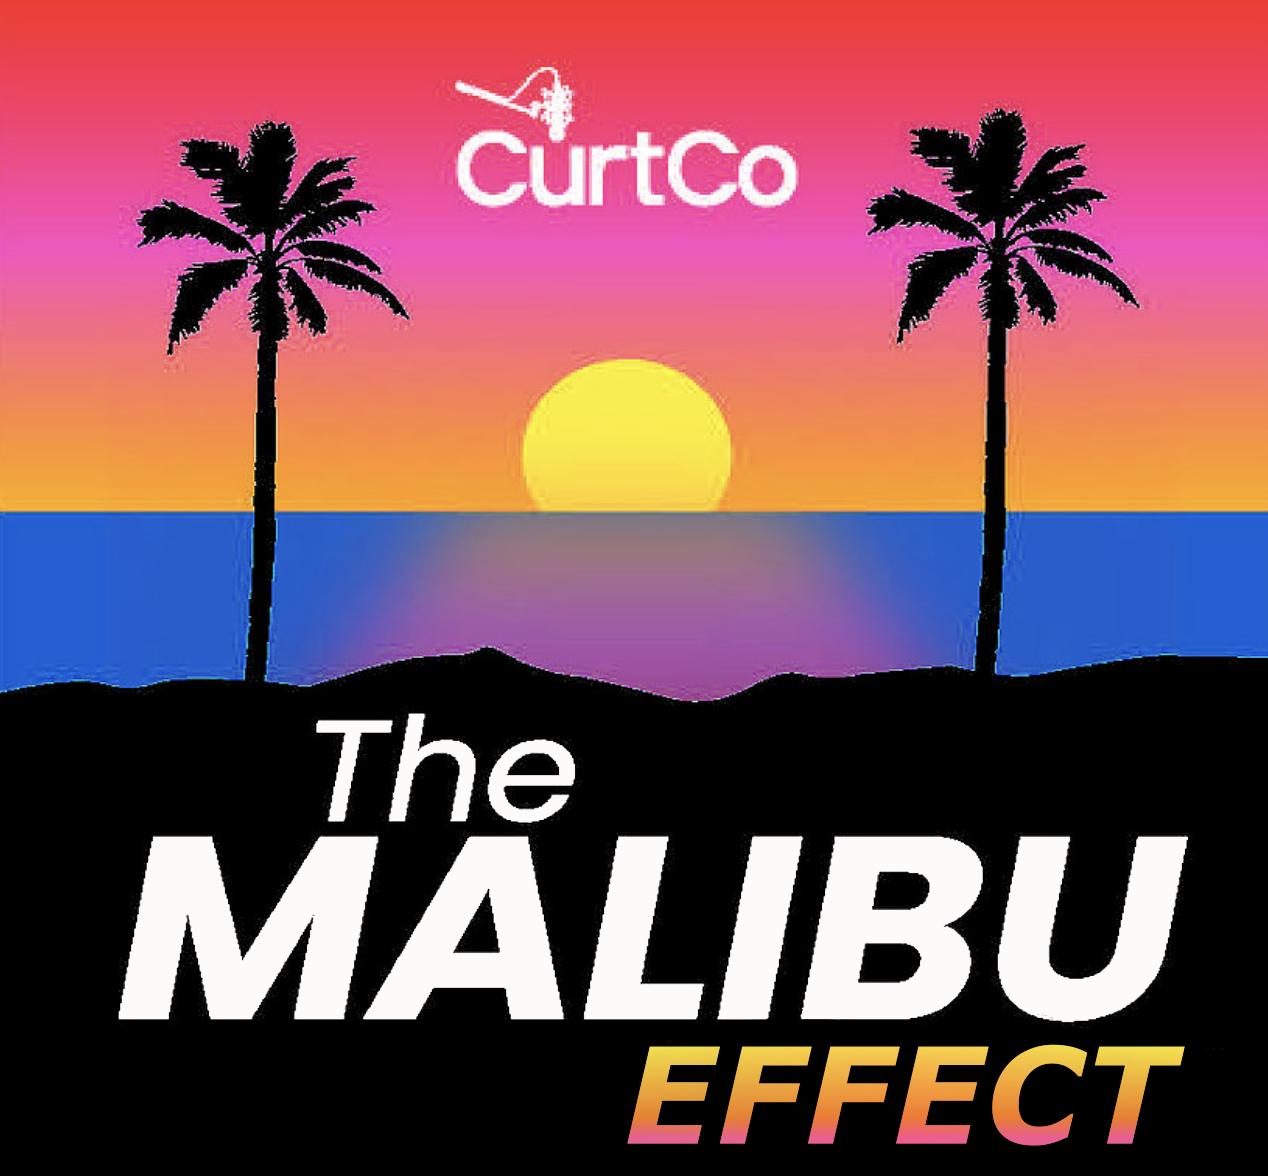 The Malibu Effect